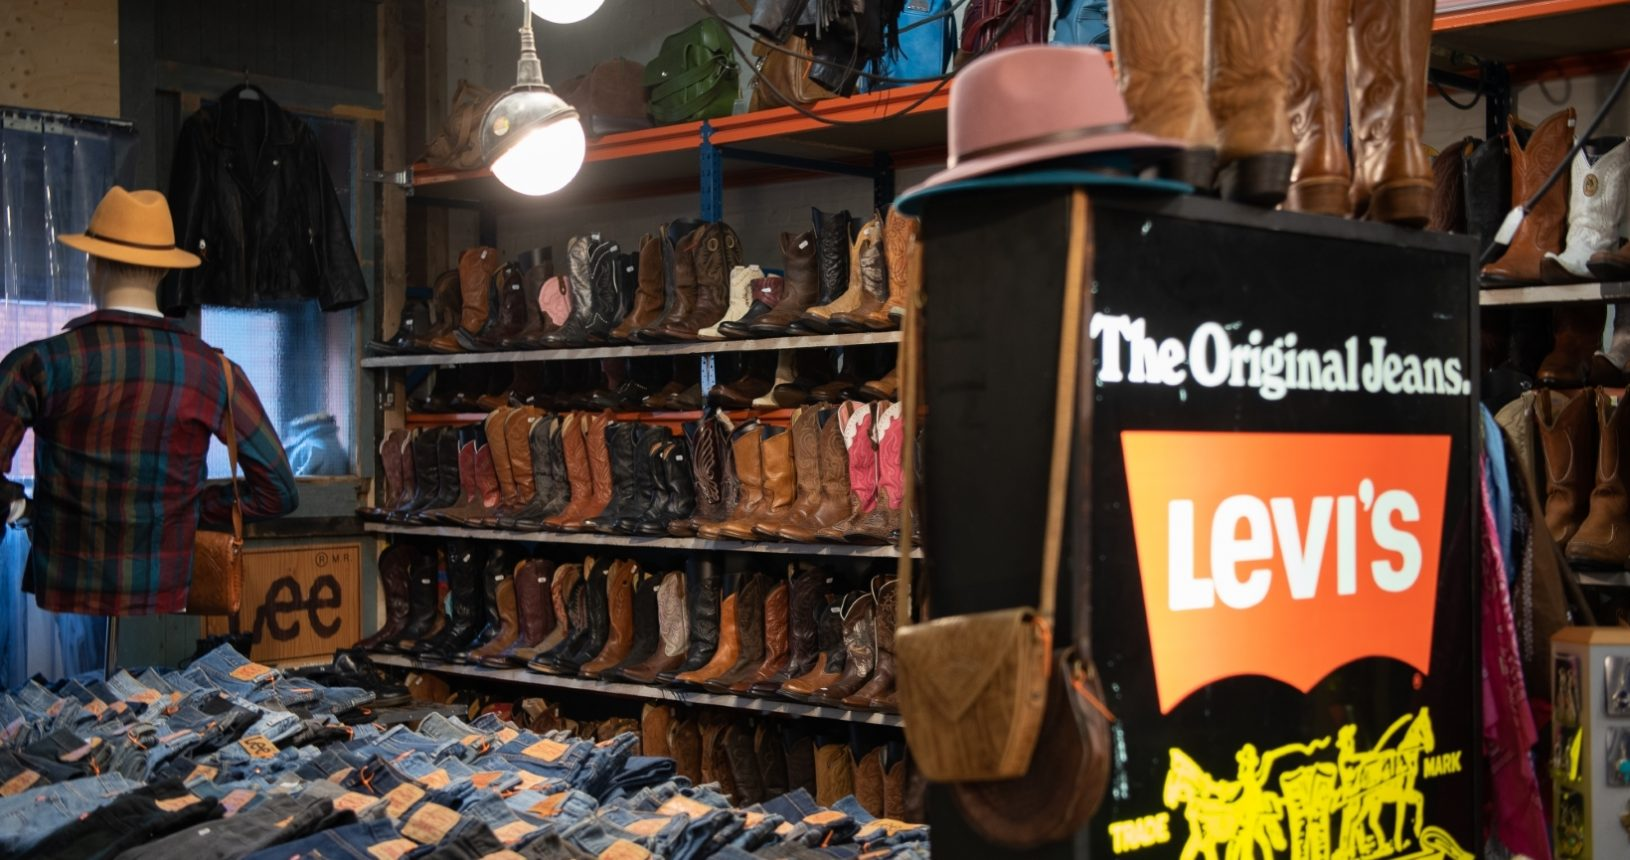 denim-and-boots-nijmegen-184